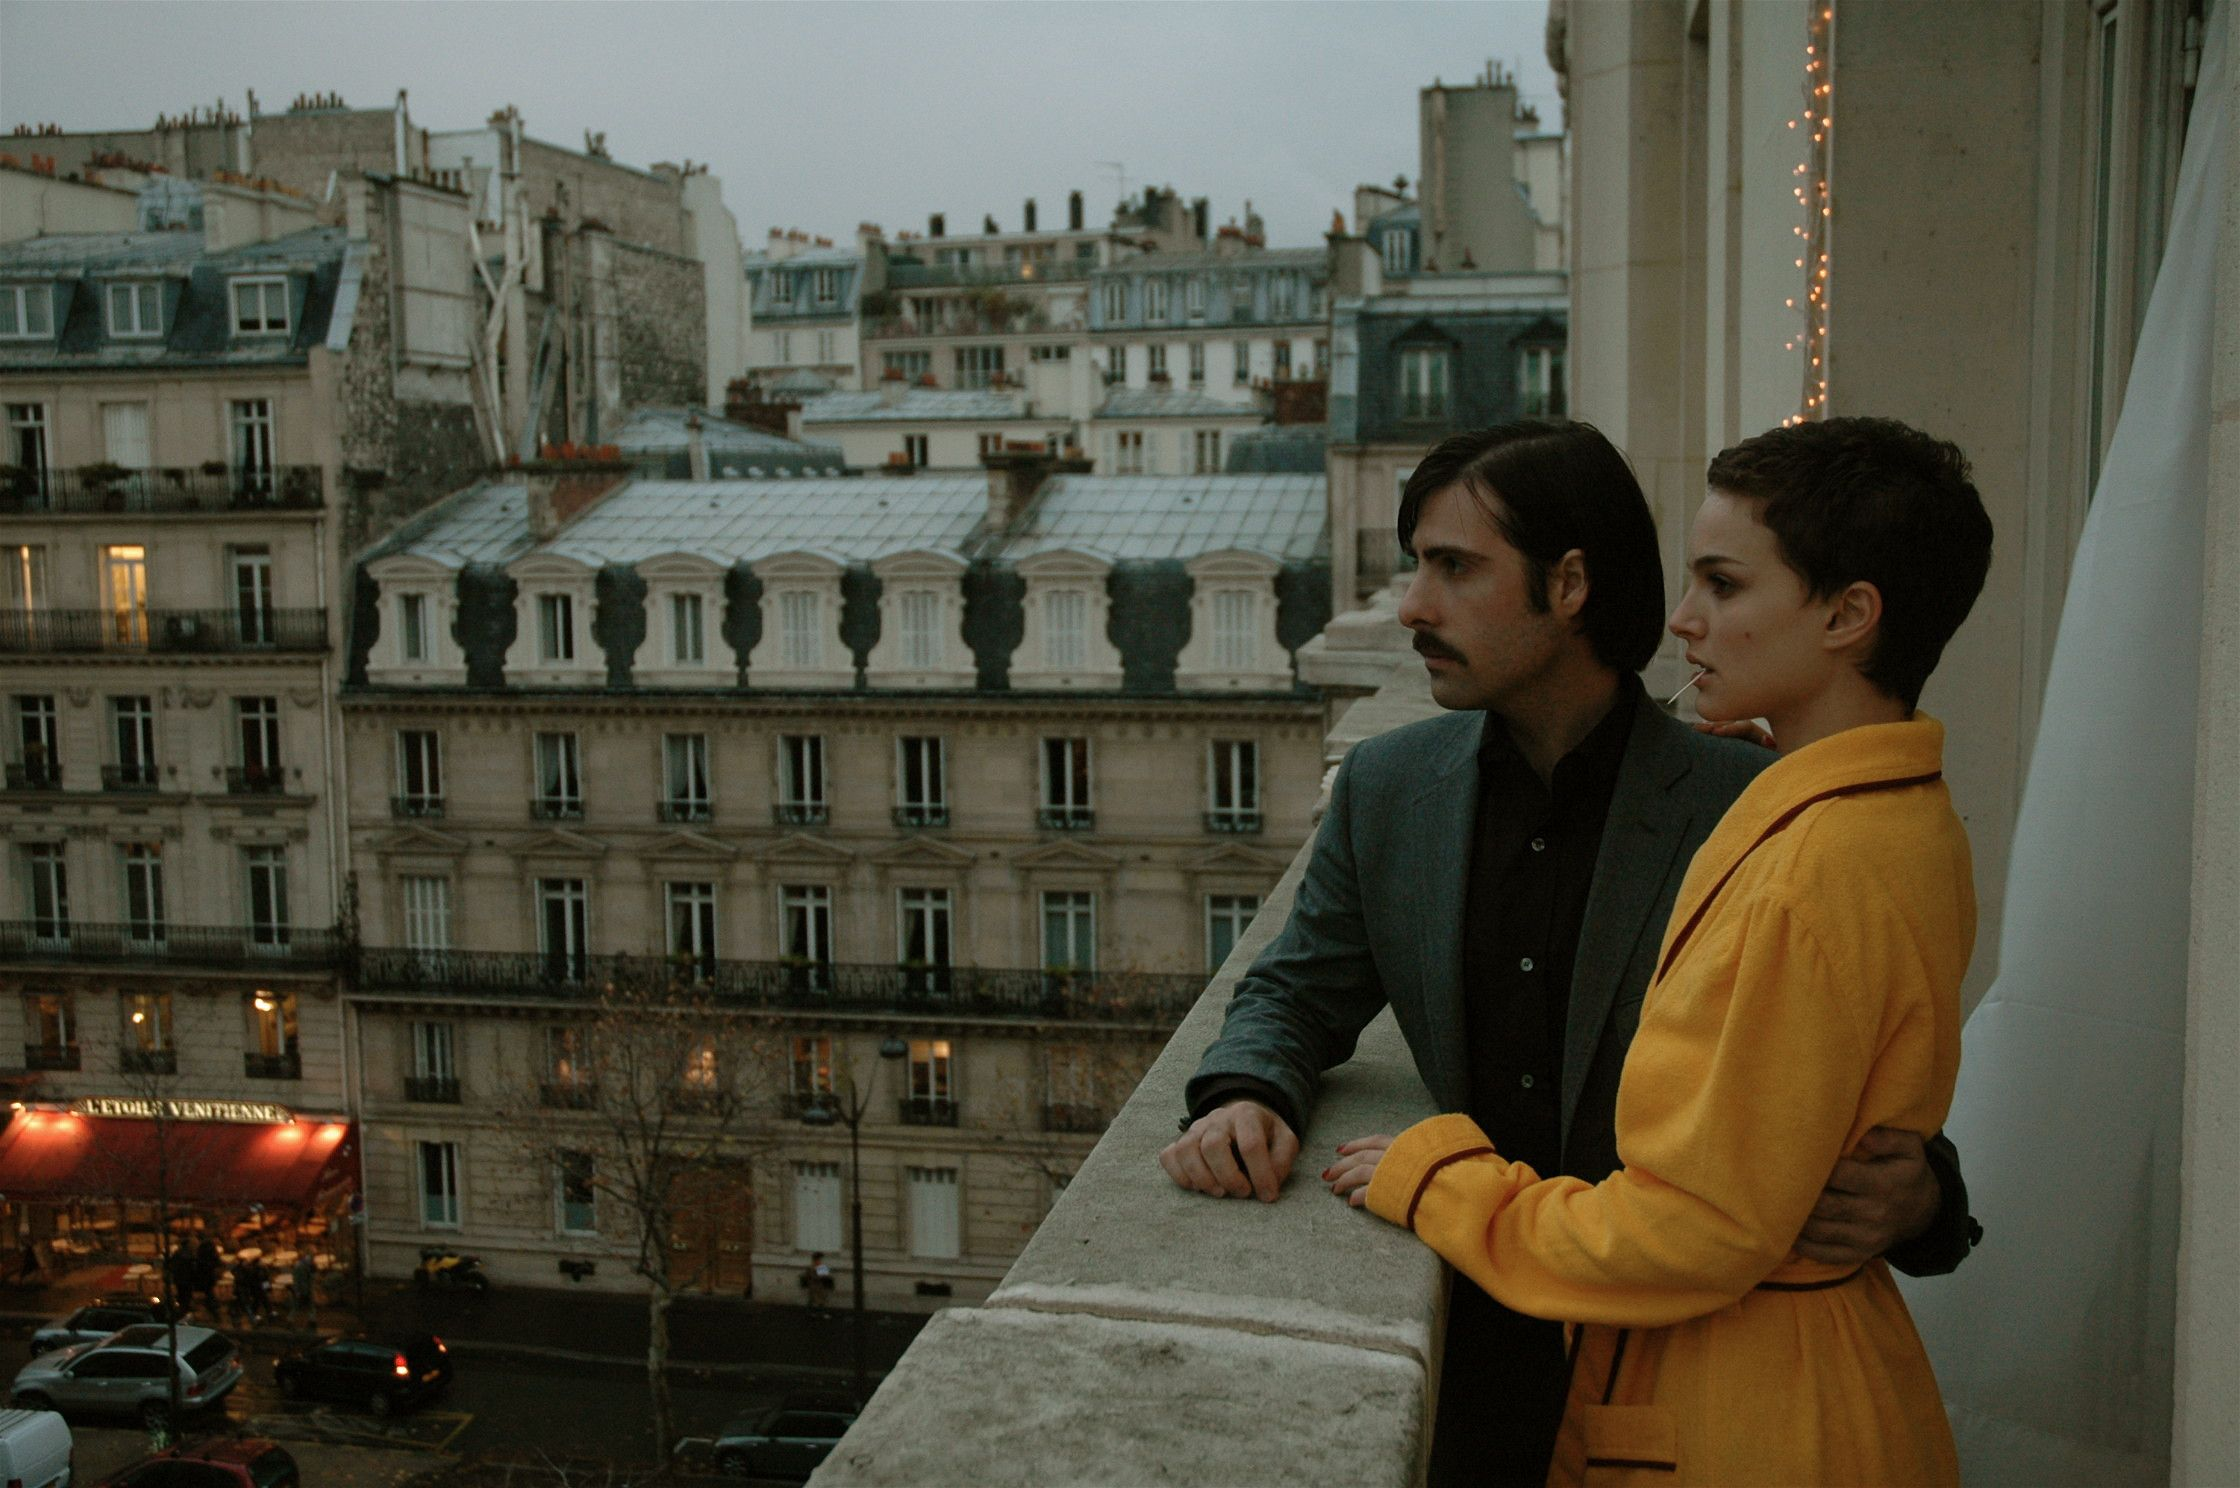 Hotel Chevalier (2007) #films #movies #ShortFilm #00s #